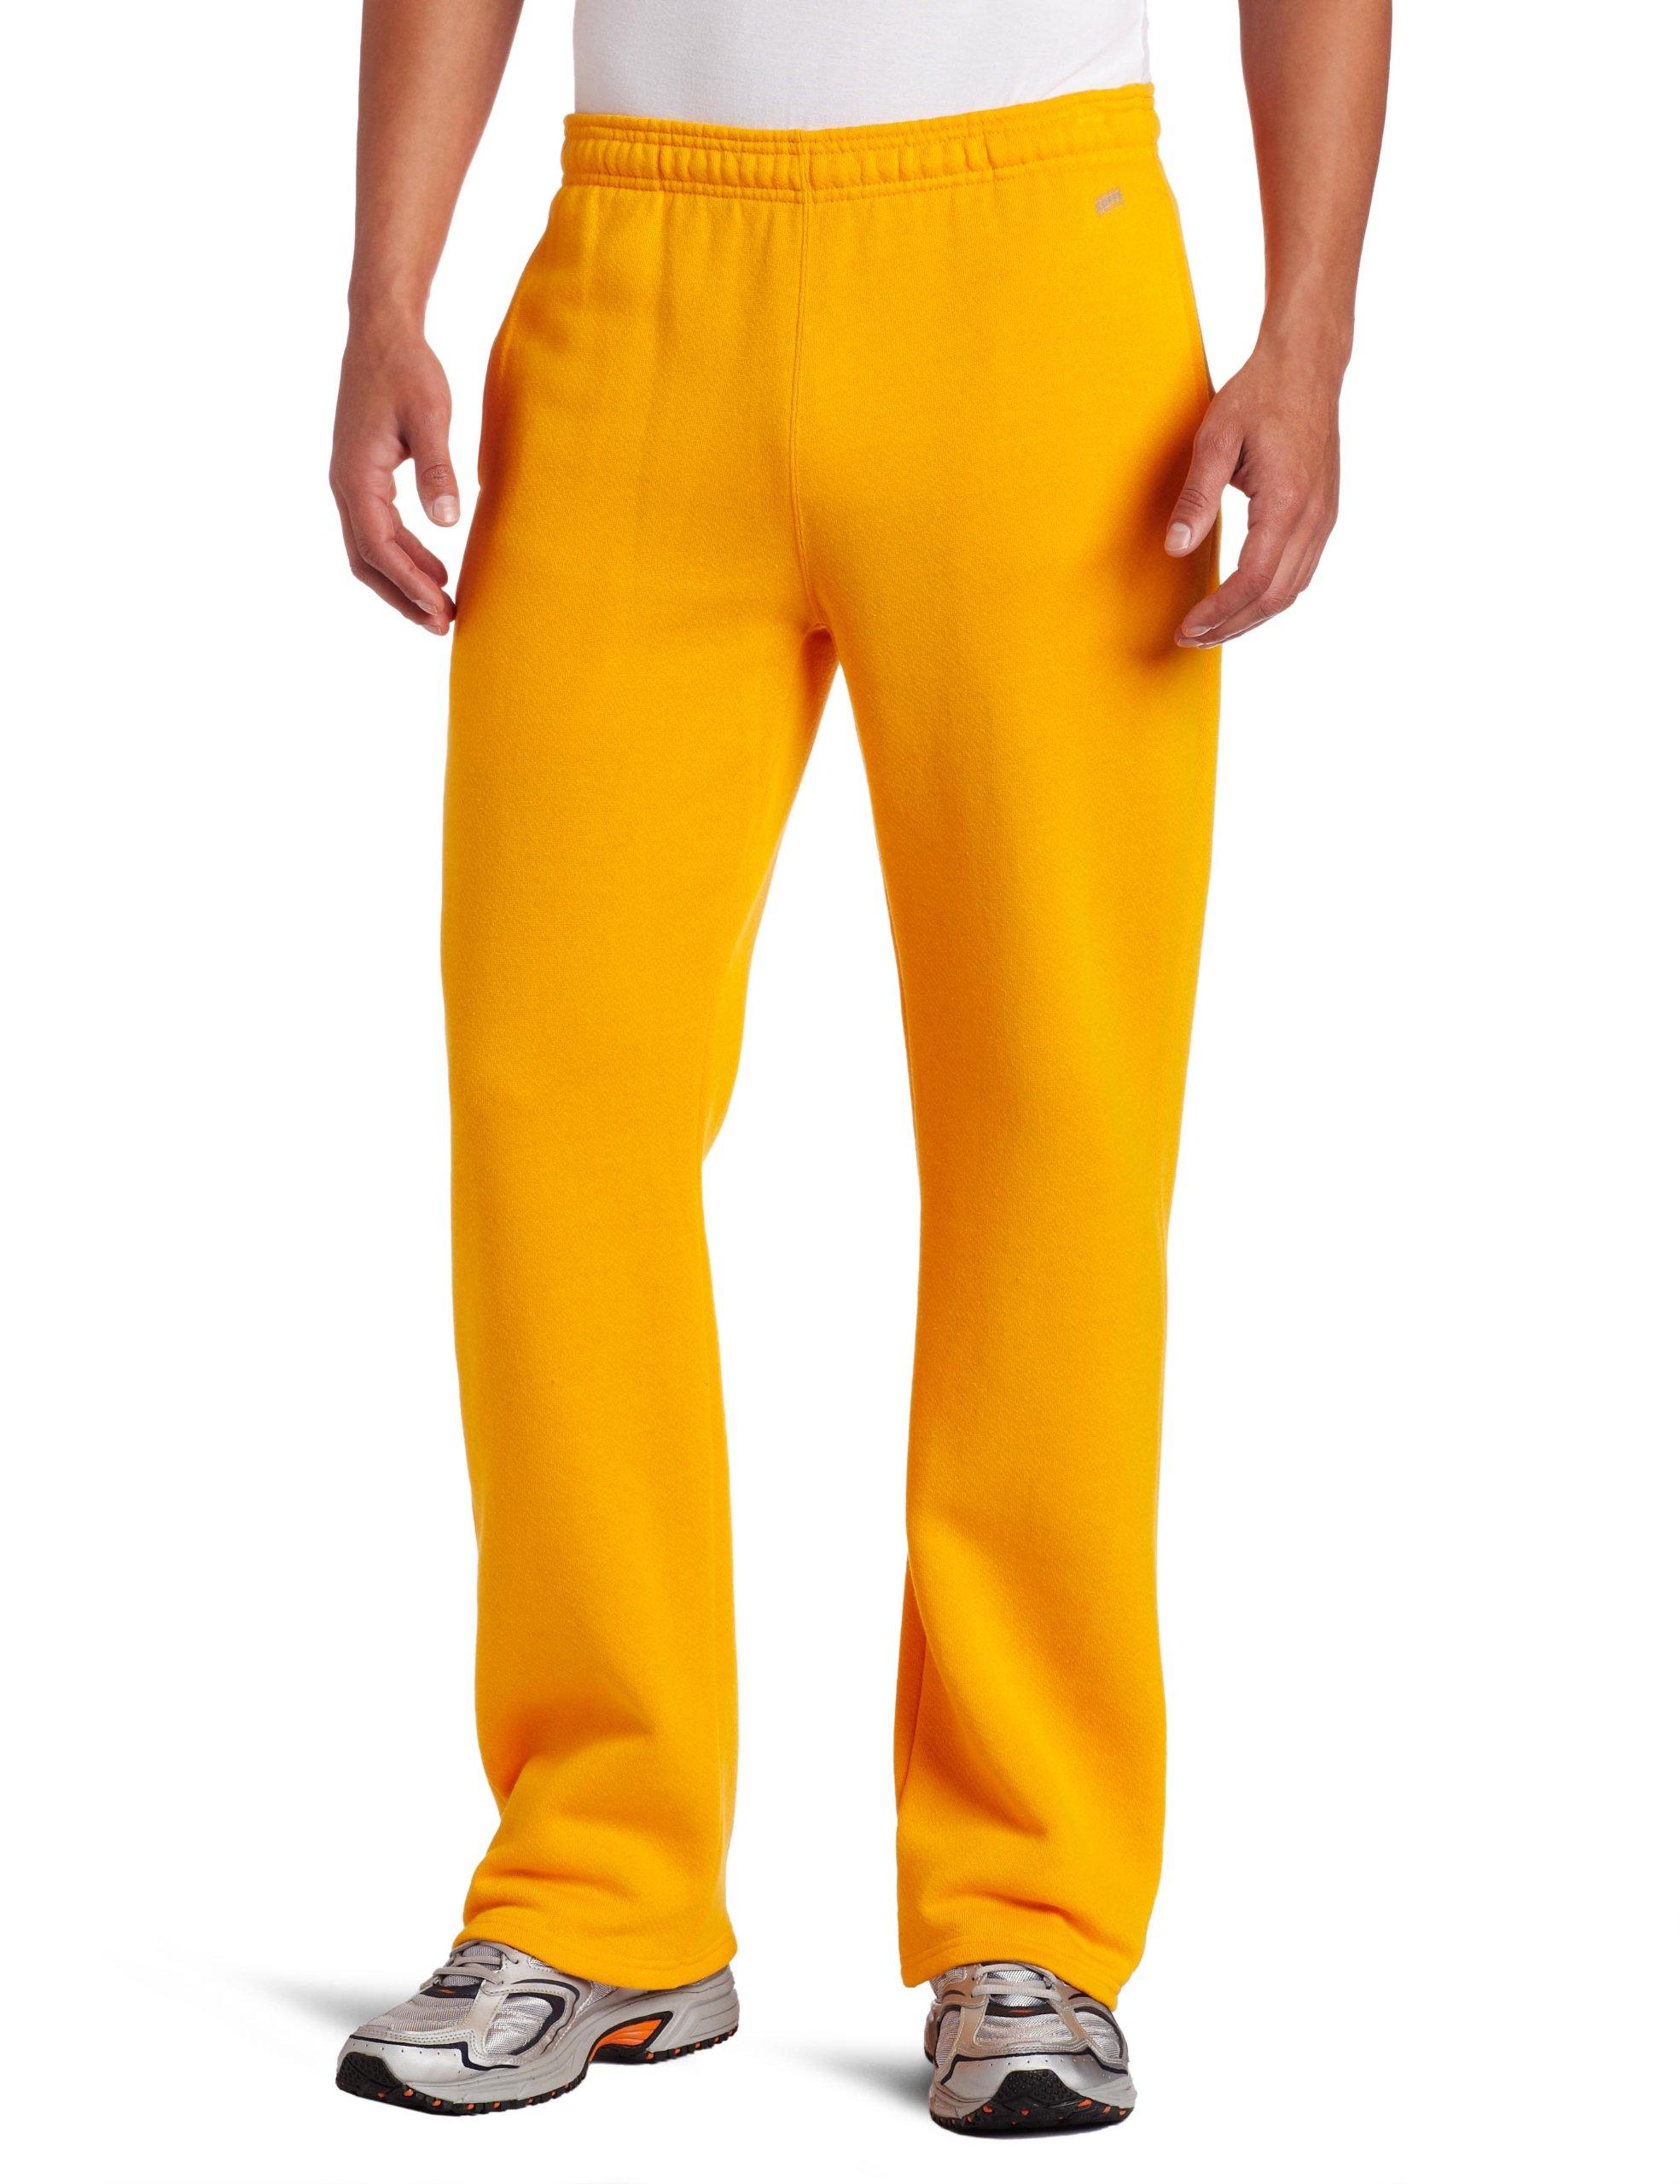 Soffe Men's Training Fleece Pocket Pant Gold Small